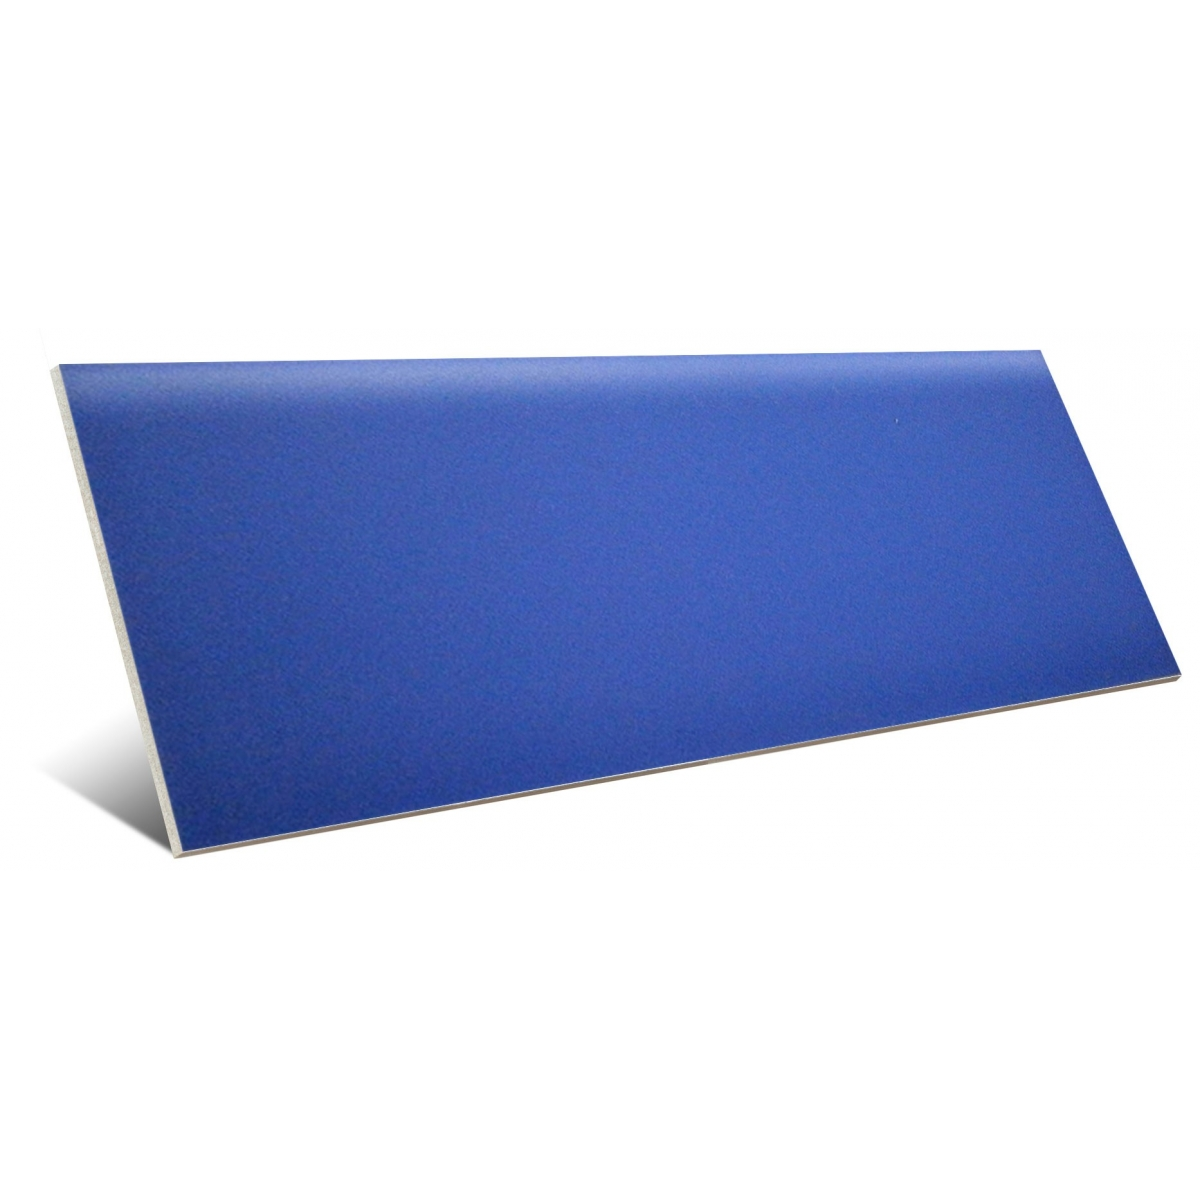 Rodapié Azul Victorian 7,5x20 (ud)